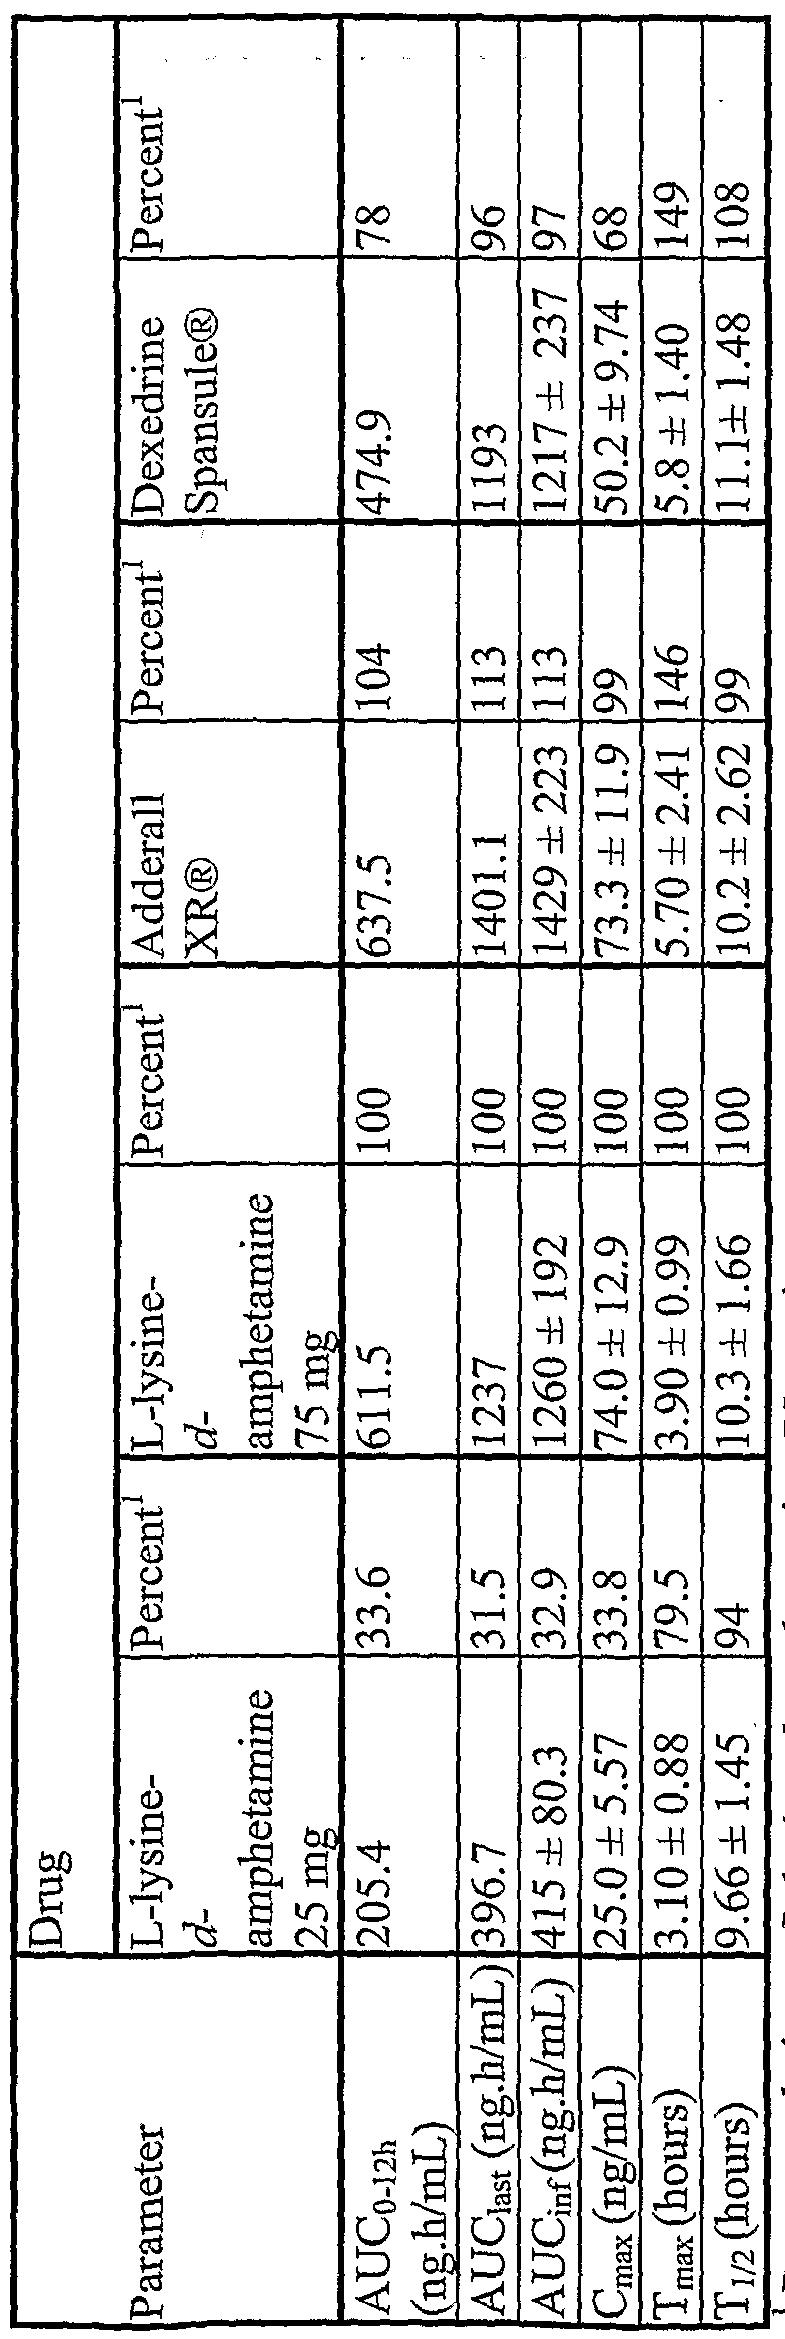 Amphetamine formulations - Feng, Hengsheng